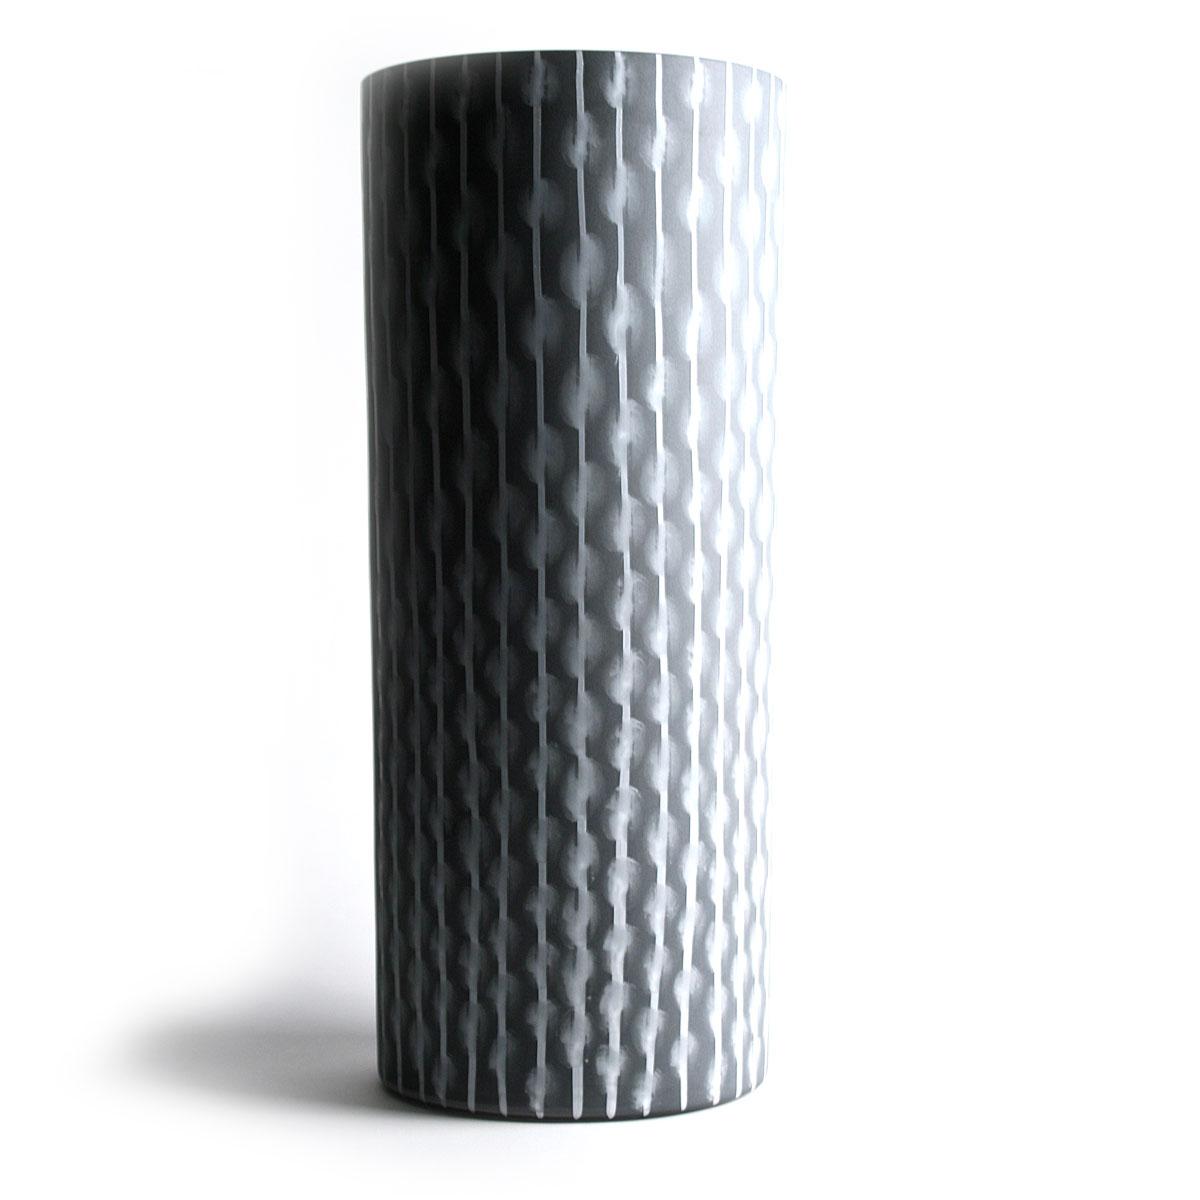 Orrefors Crystal, Art Piece Ingegerd Raman Caracalla Crystal Vase Ltd 200